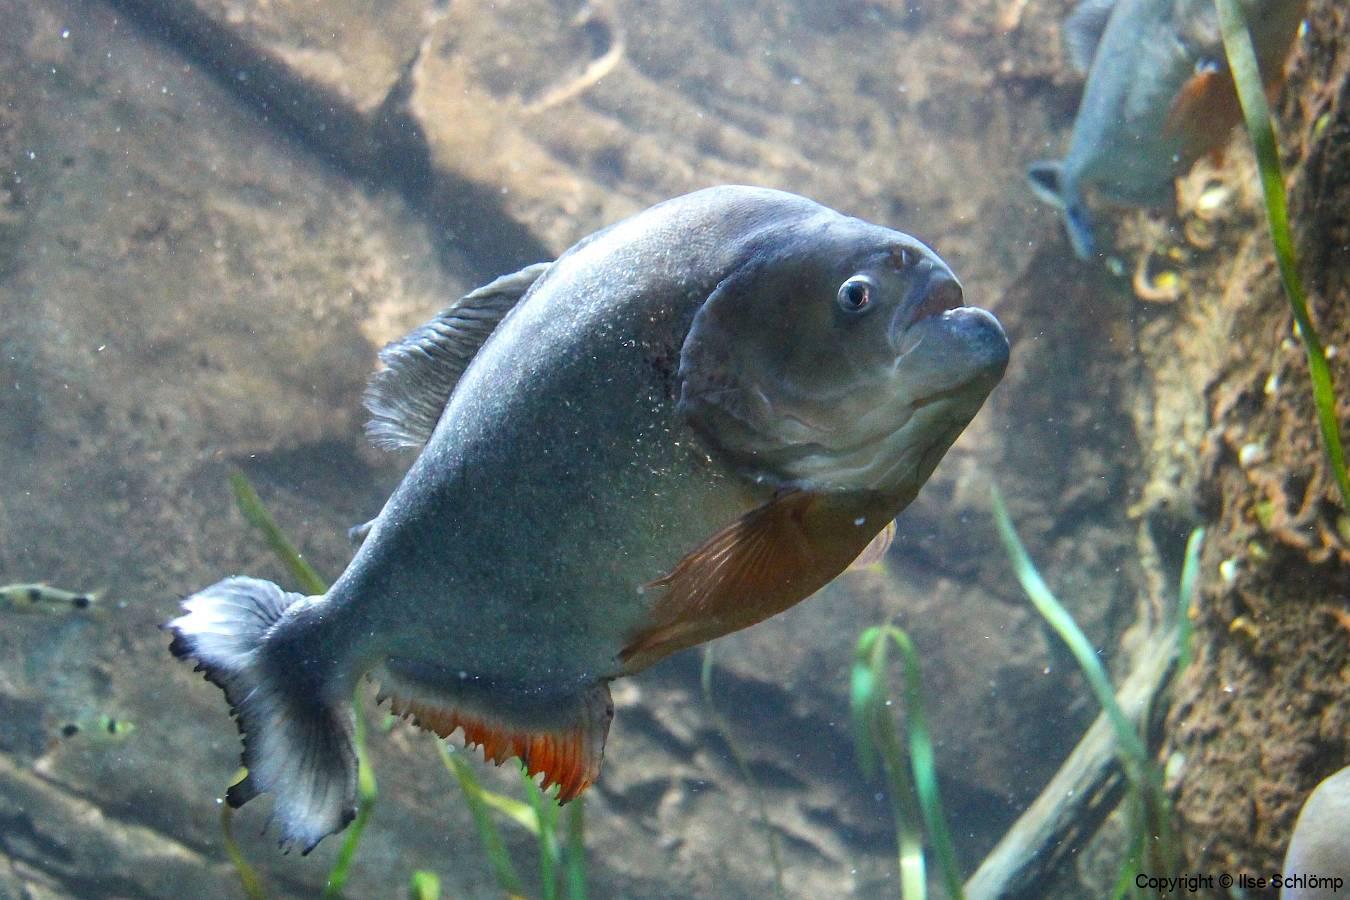 USA, Georgia, Atlanta, Georgia Aquarium, Piranha